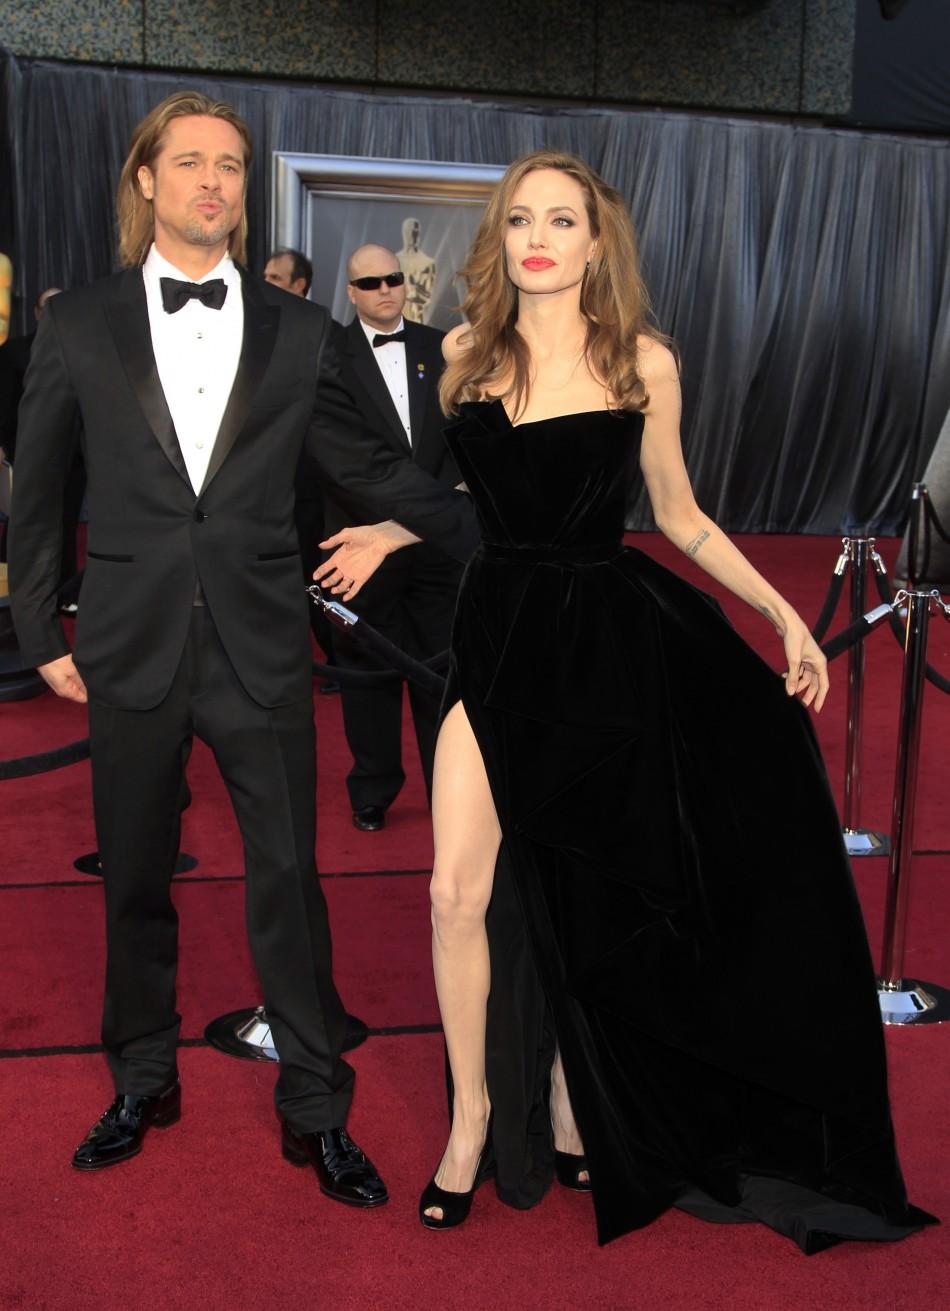 Oscars 2012: Angelina Jolie's Leg Show at the Red Carpet ... брэд питт и анджелина джоли